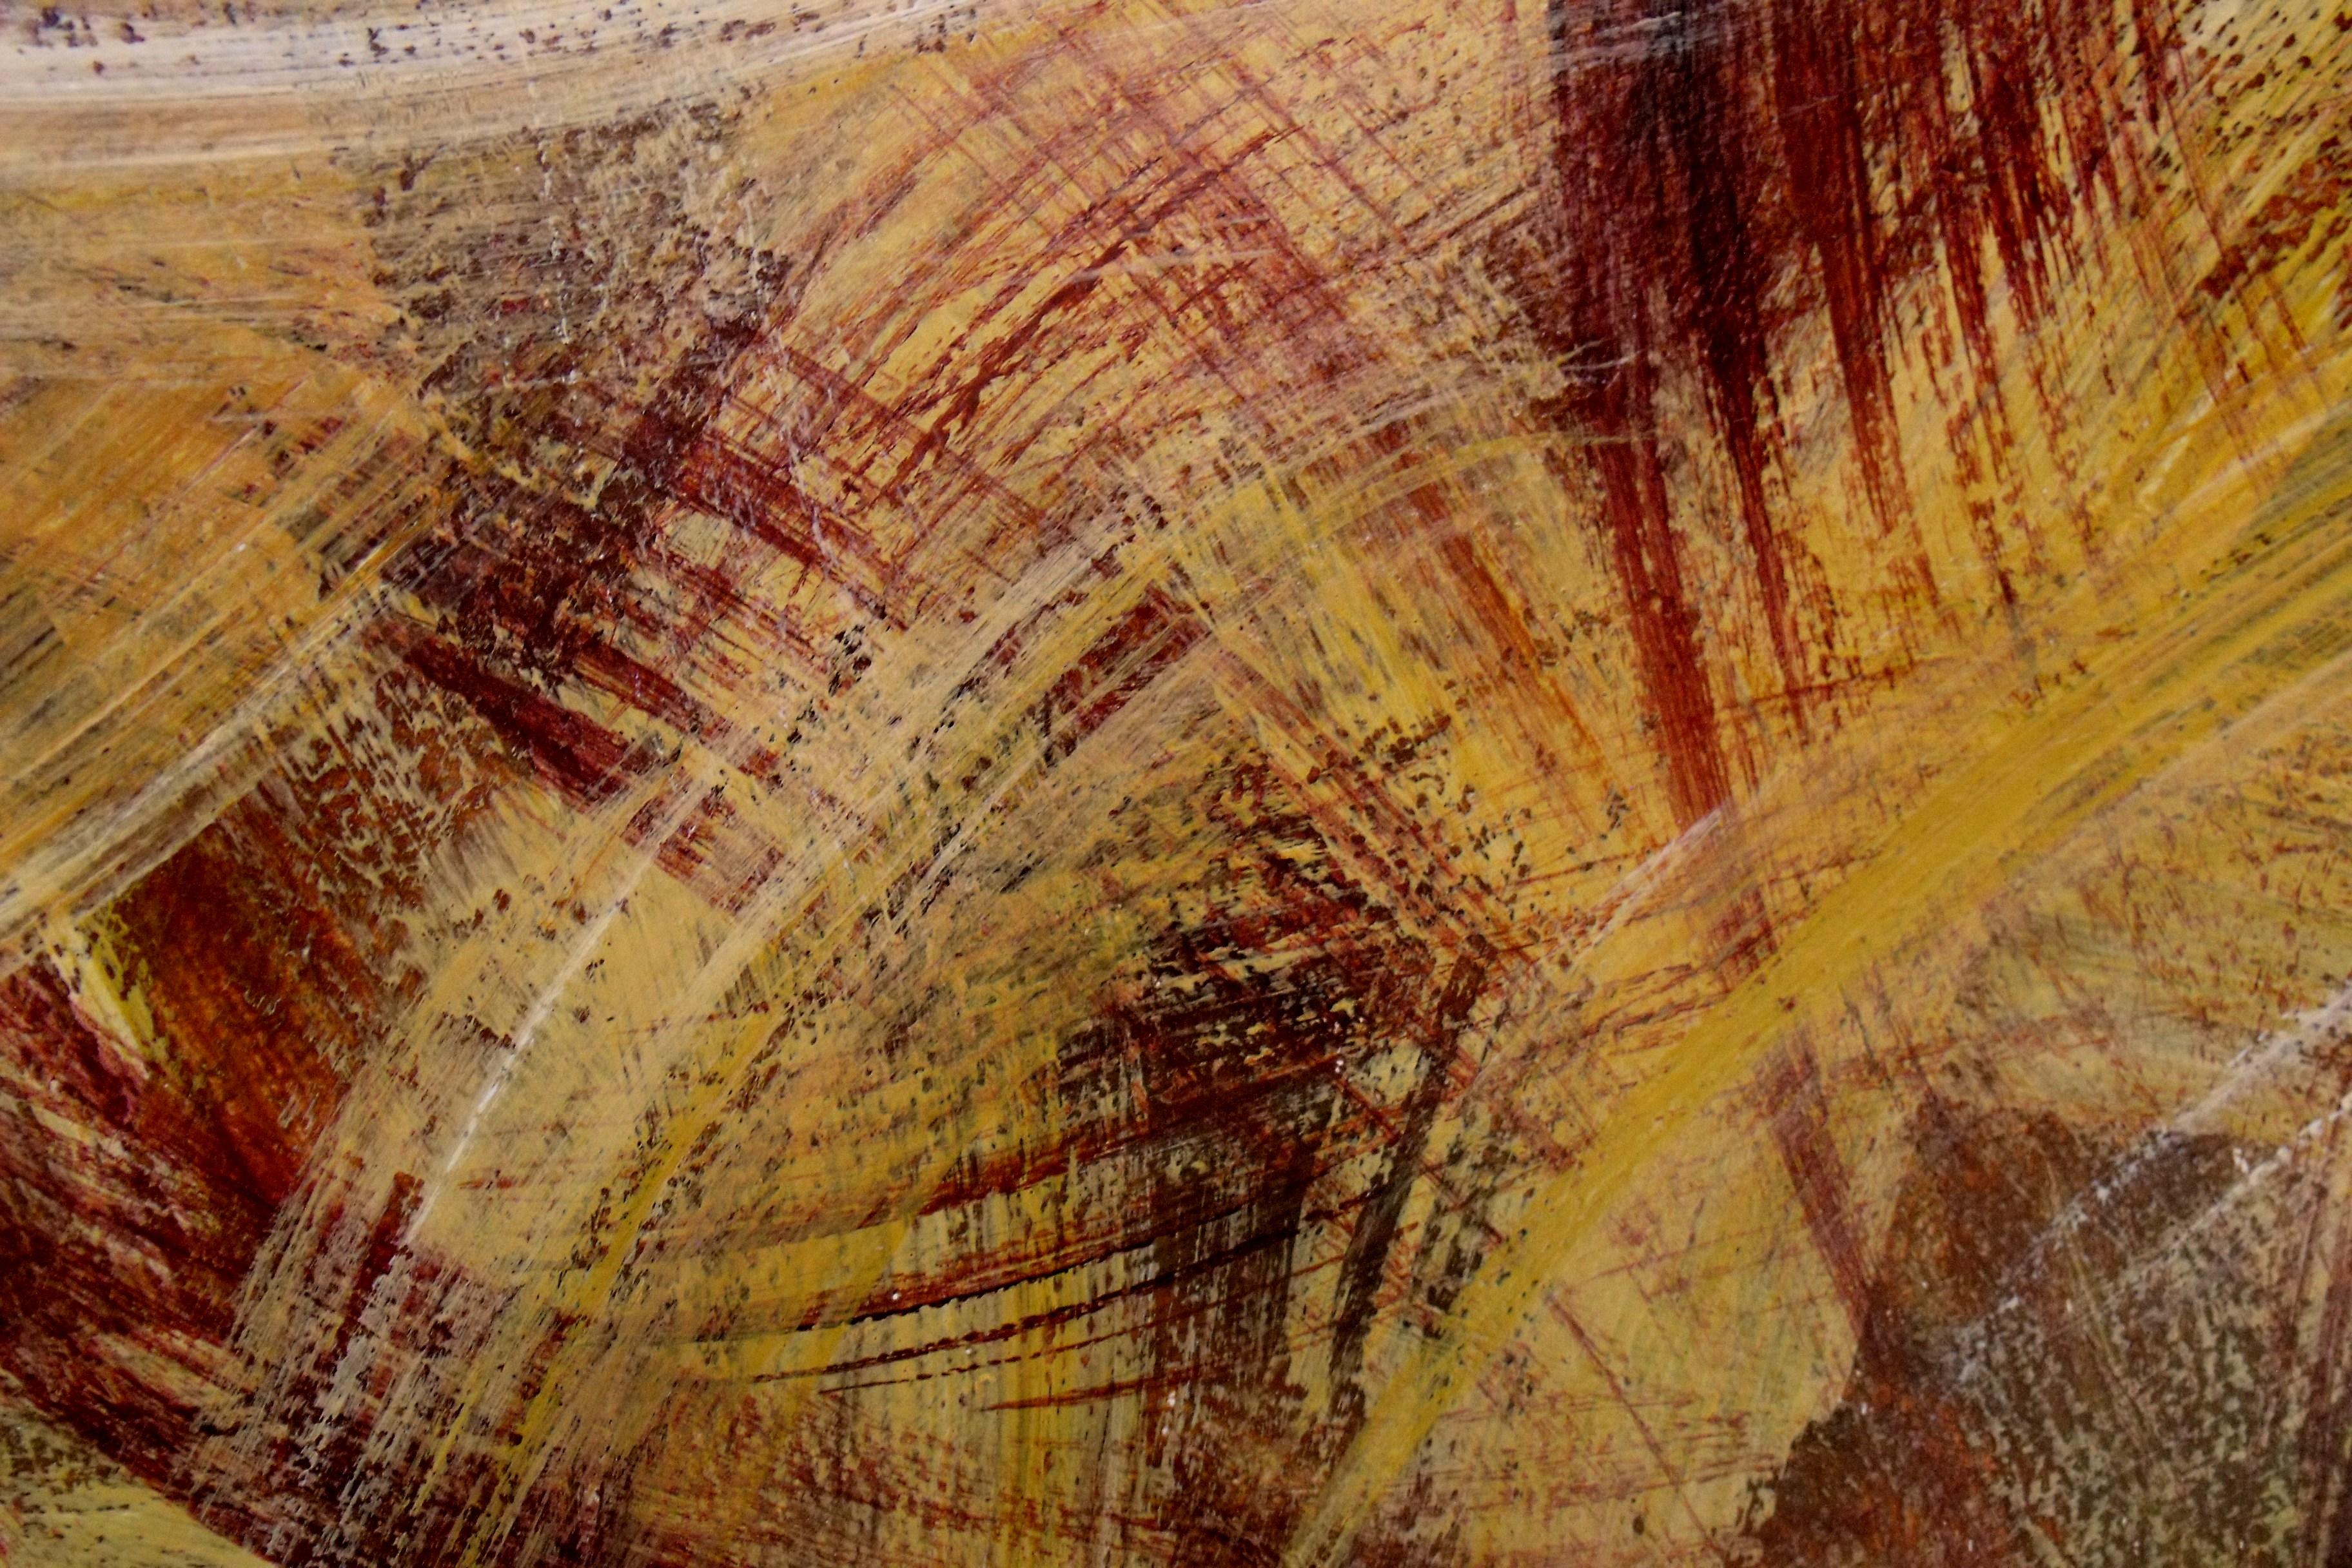 brush strokes texture - photo #15